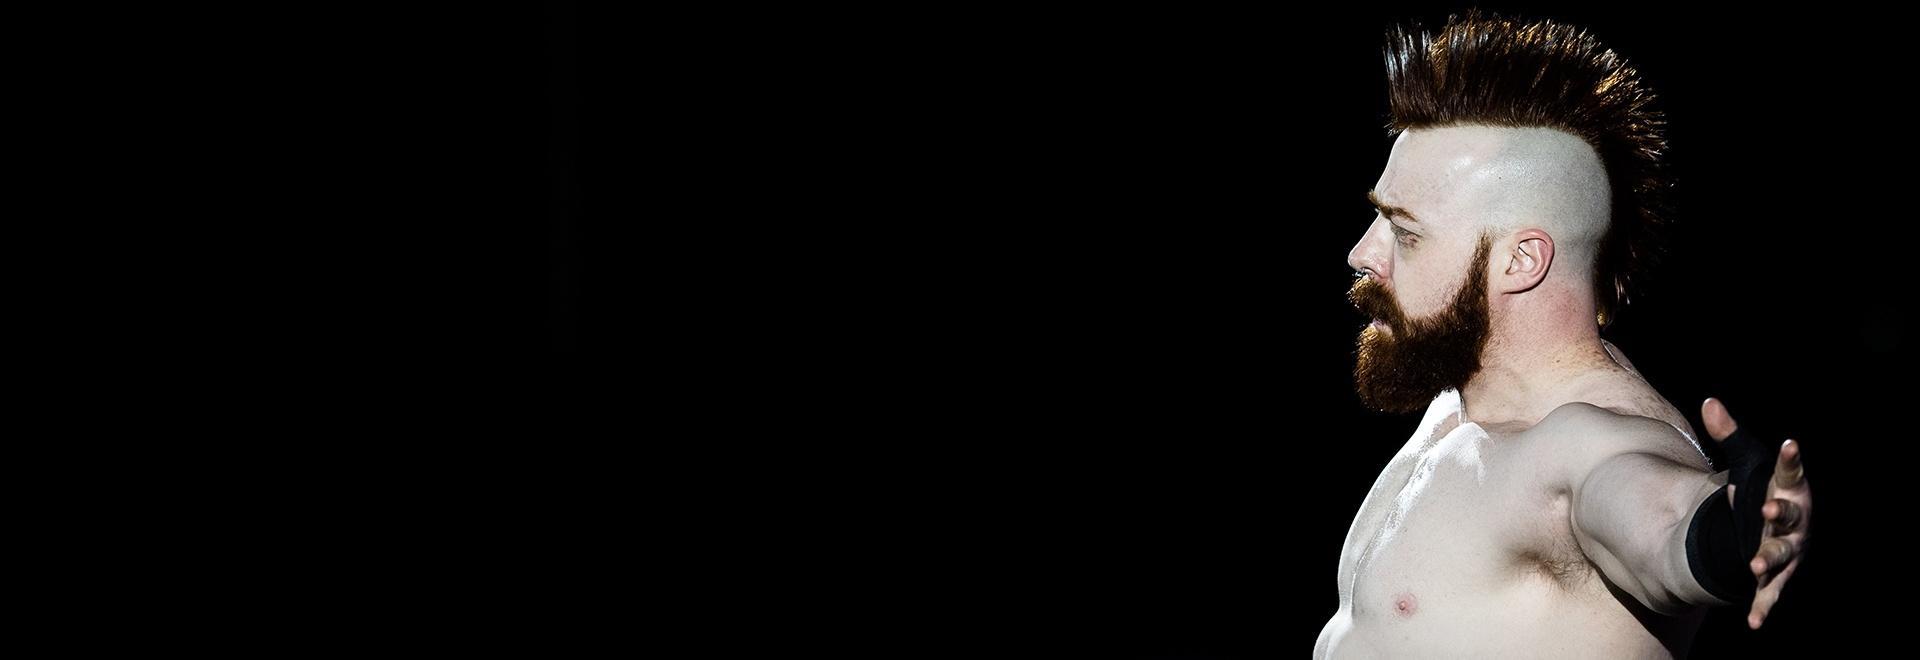 Ep. 28